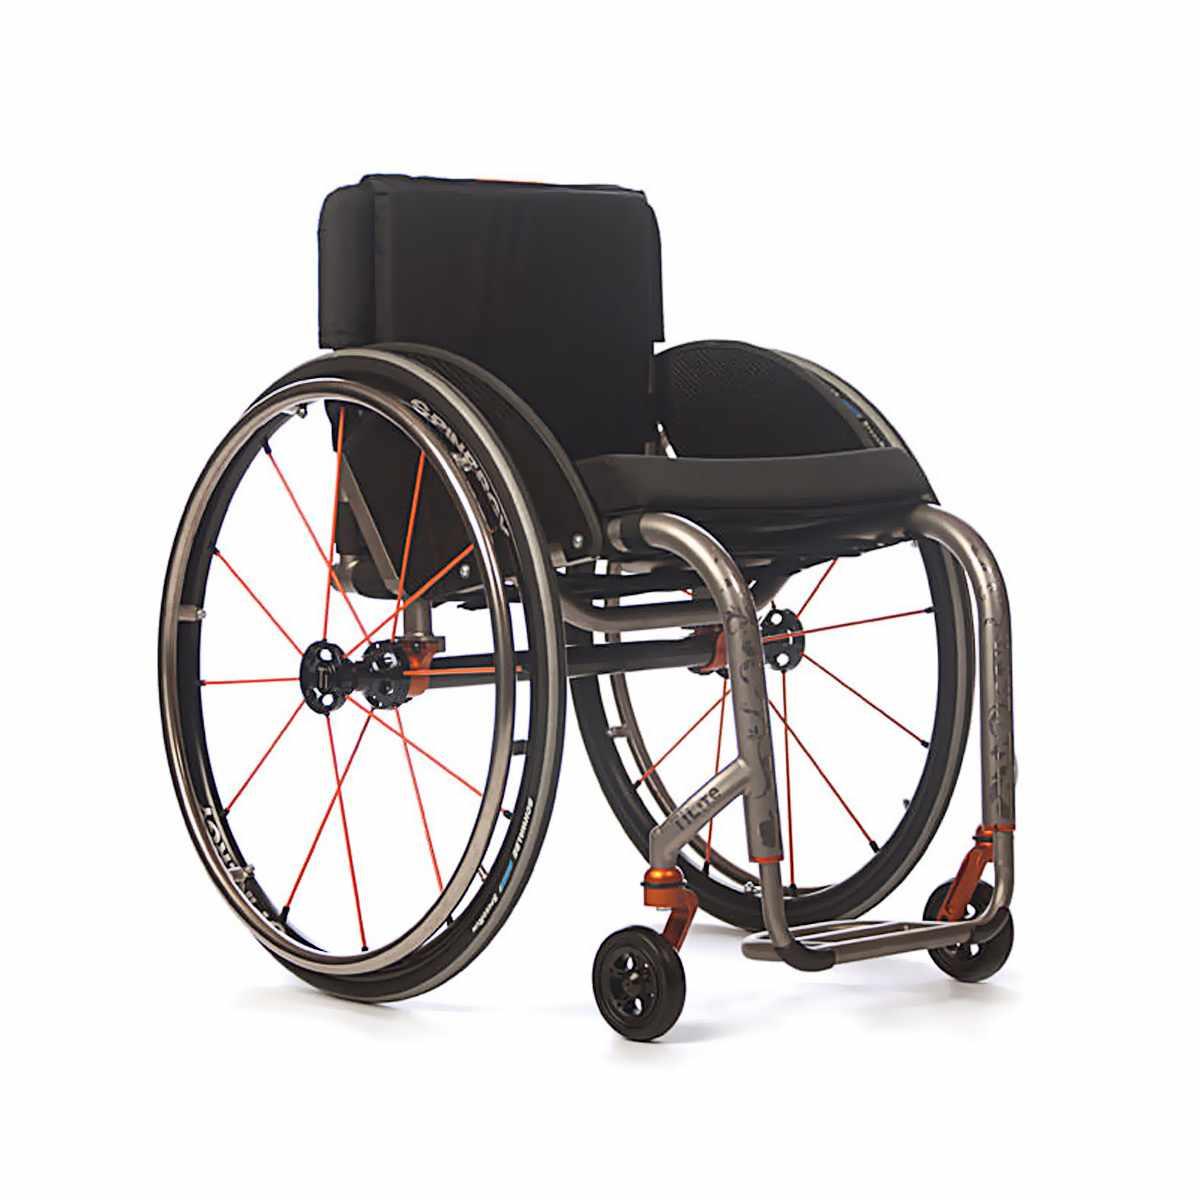 TiLite ZR series rigid ultralight wheelchair